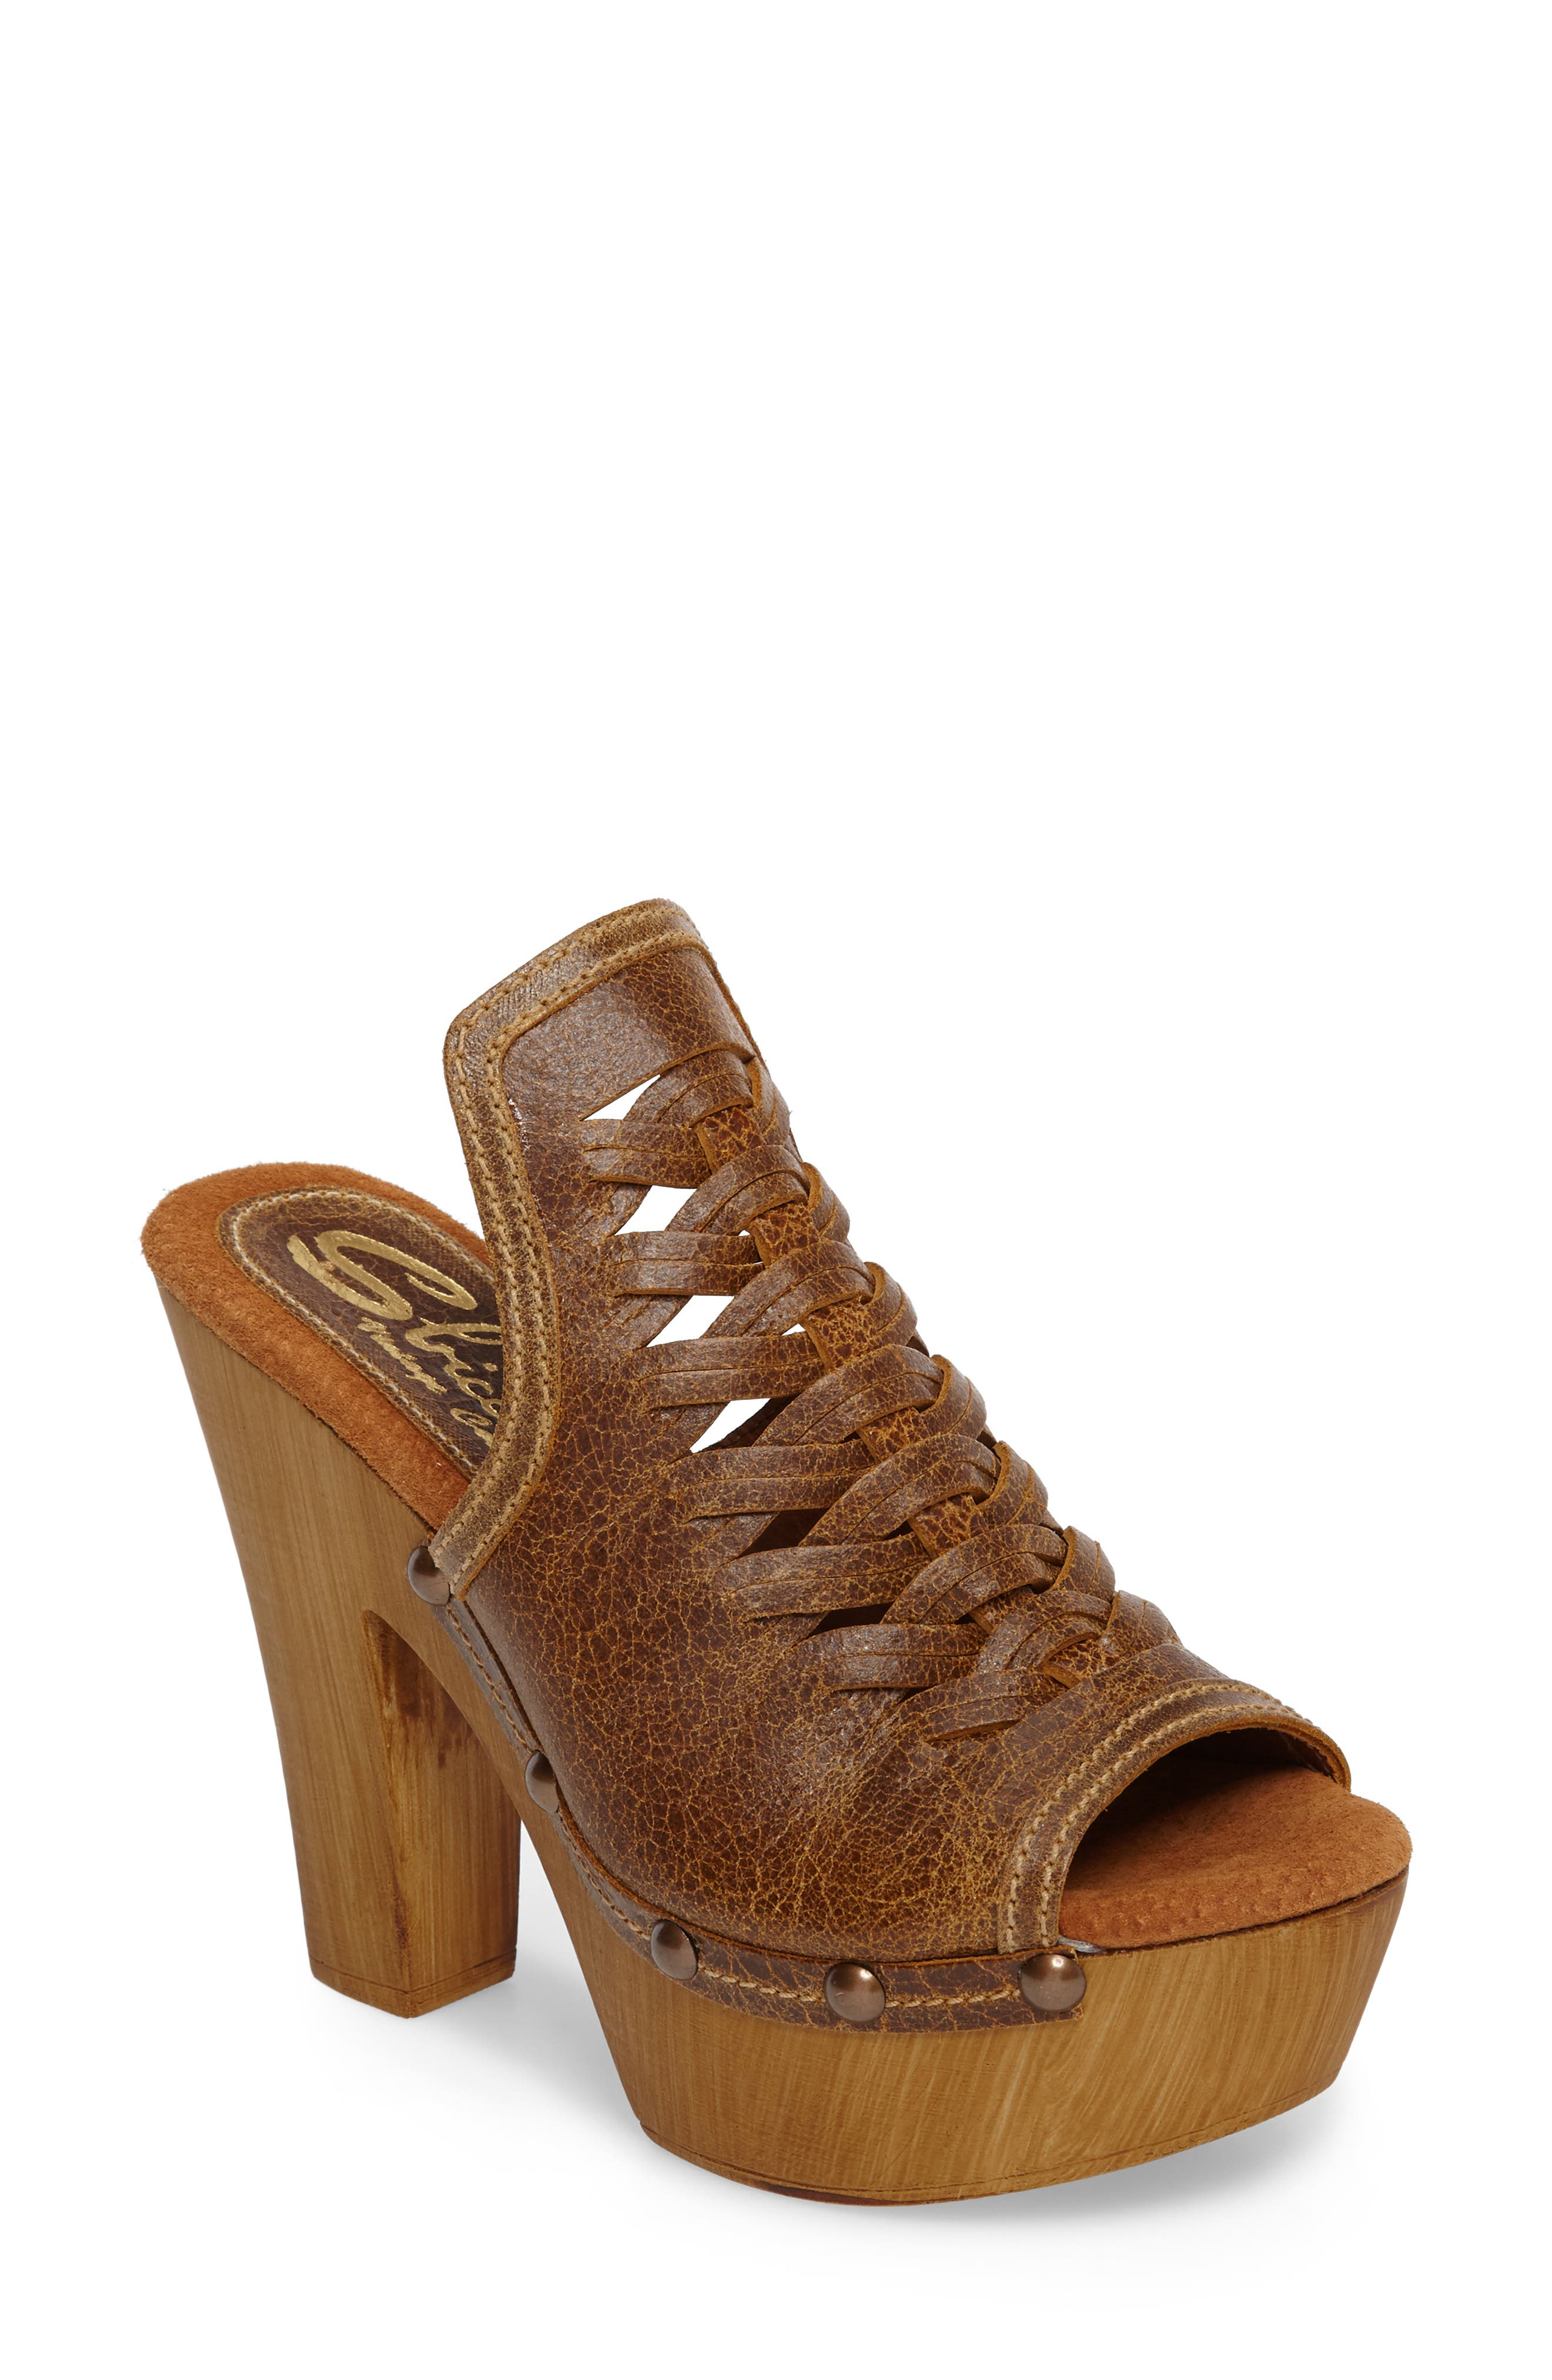 Alternate Image 1 Selected - Sbicca Kinga Platform Sandal (Women)